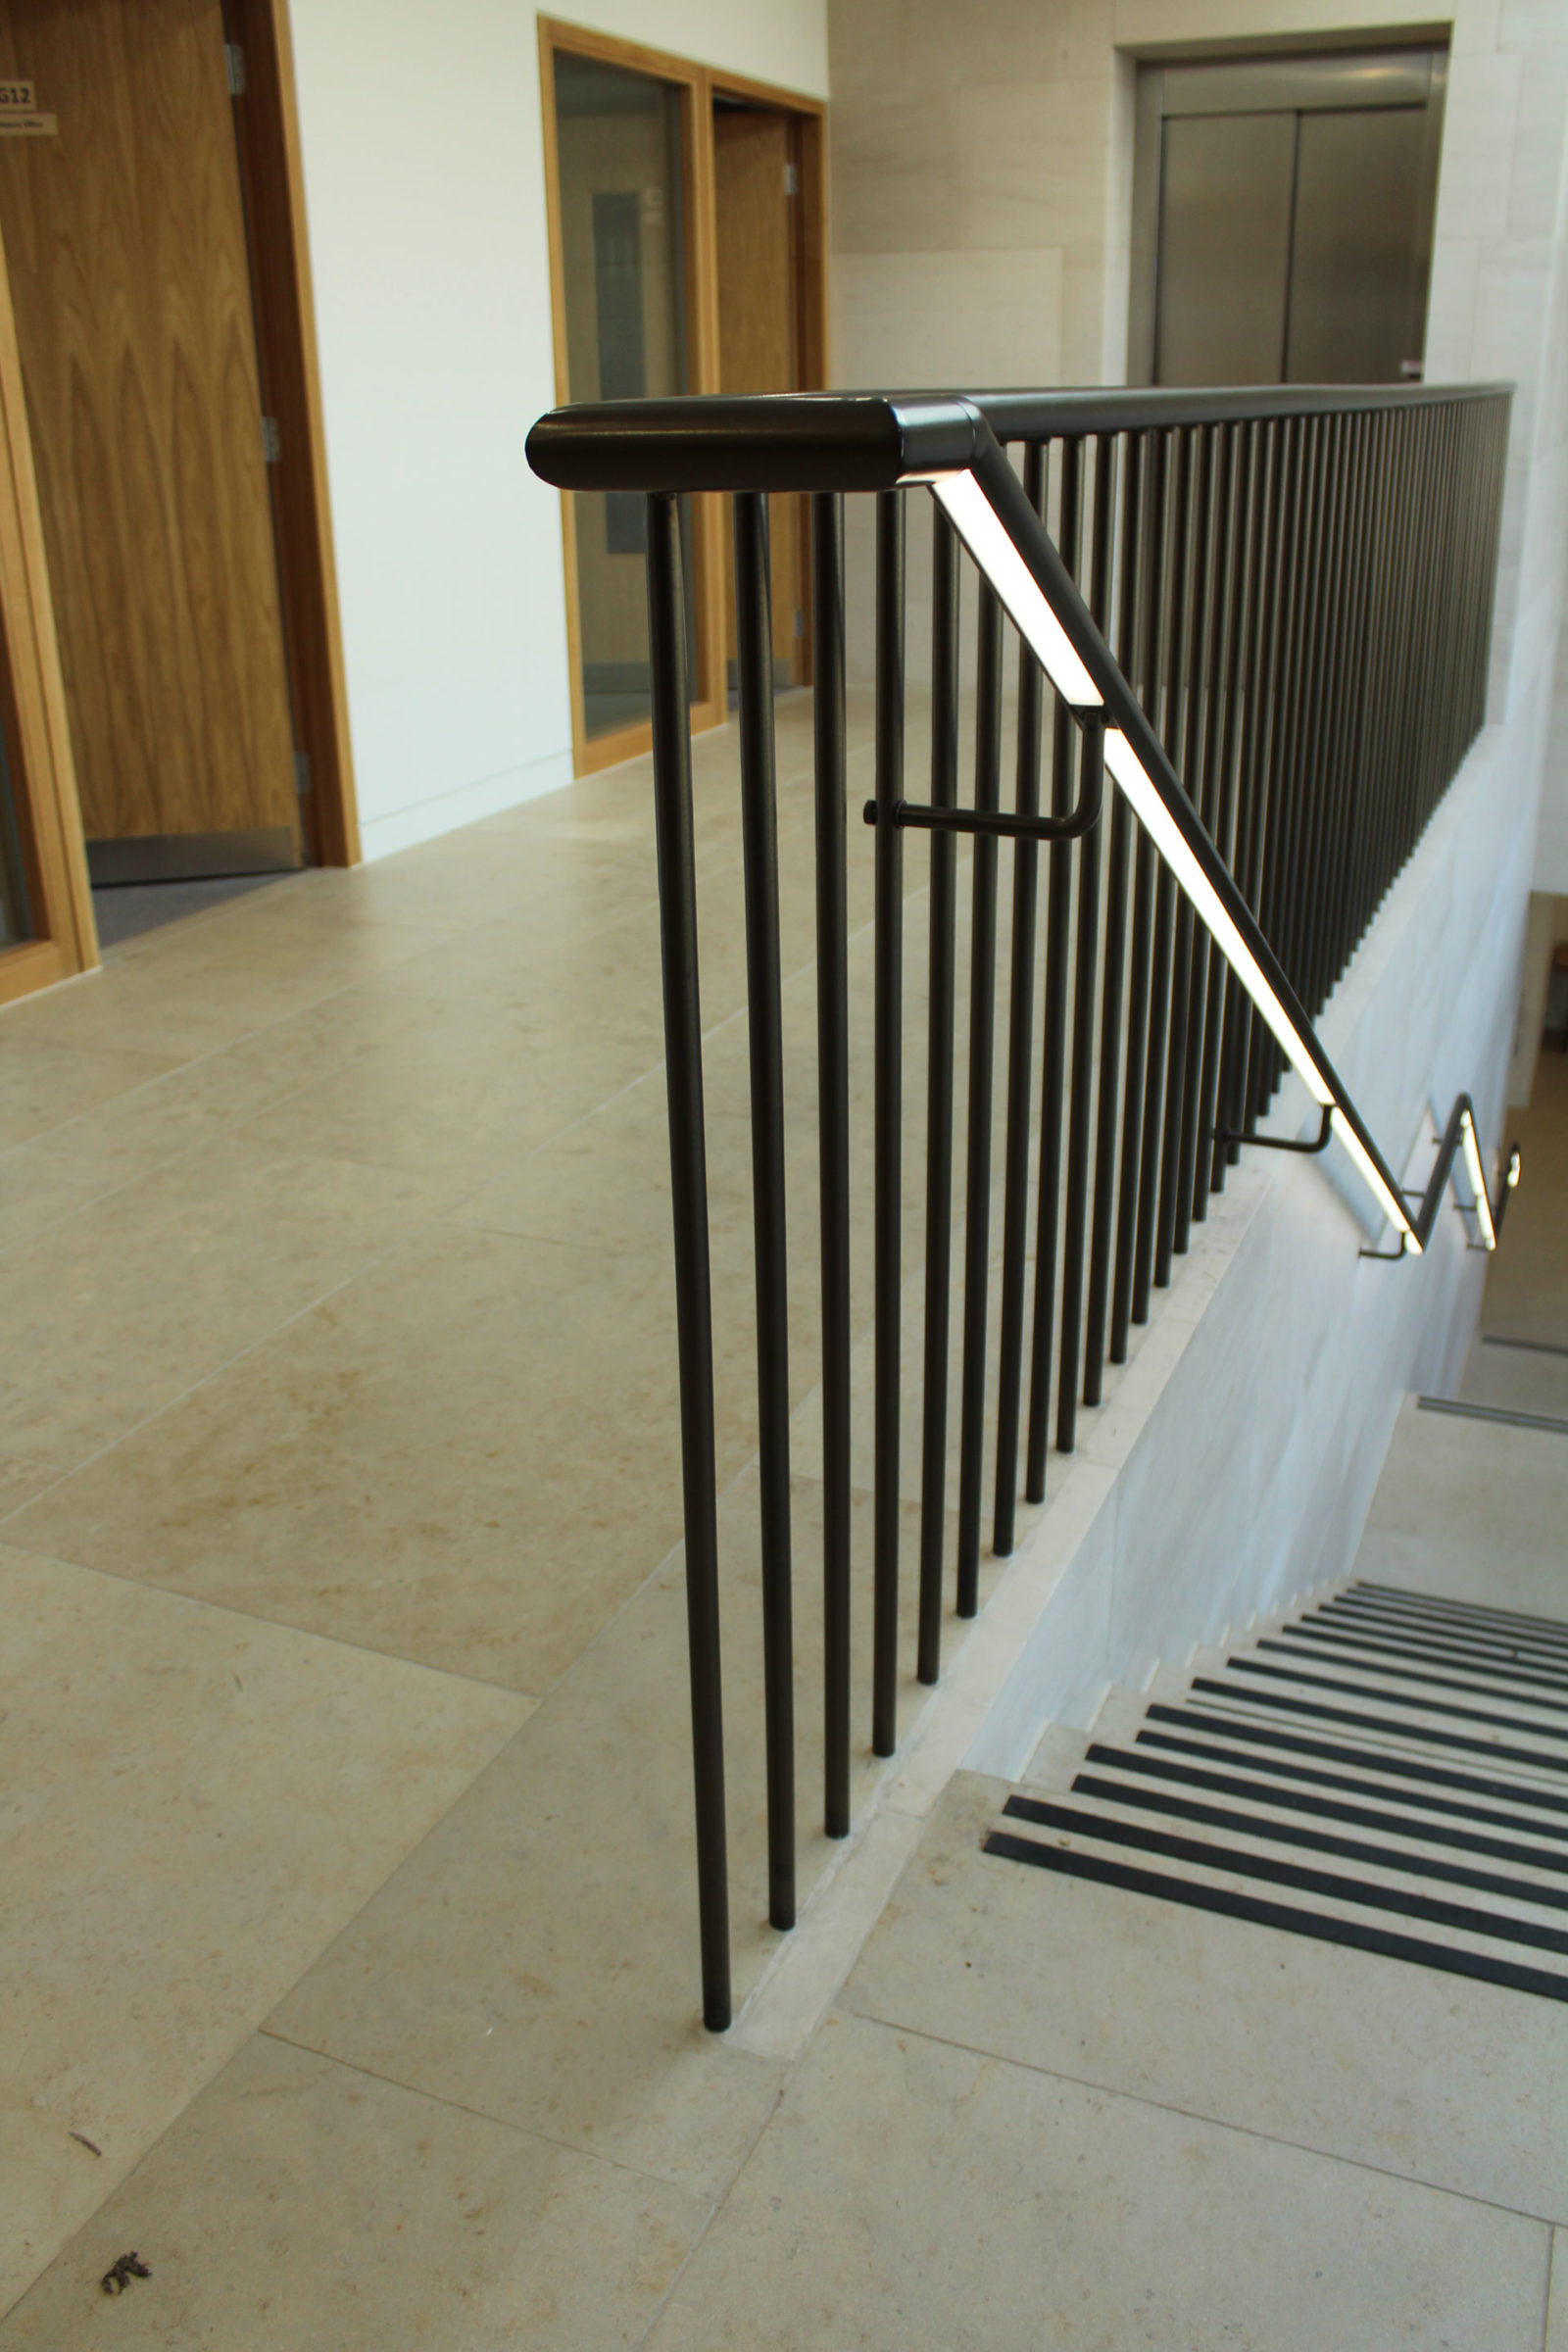 Private school lighting | Illuminated handrail Glowrail | The Light Lab